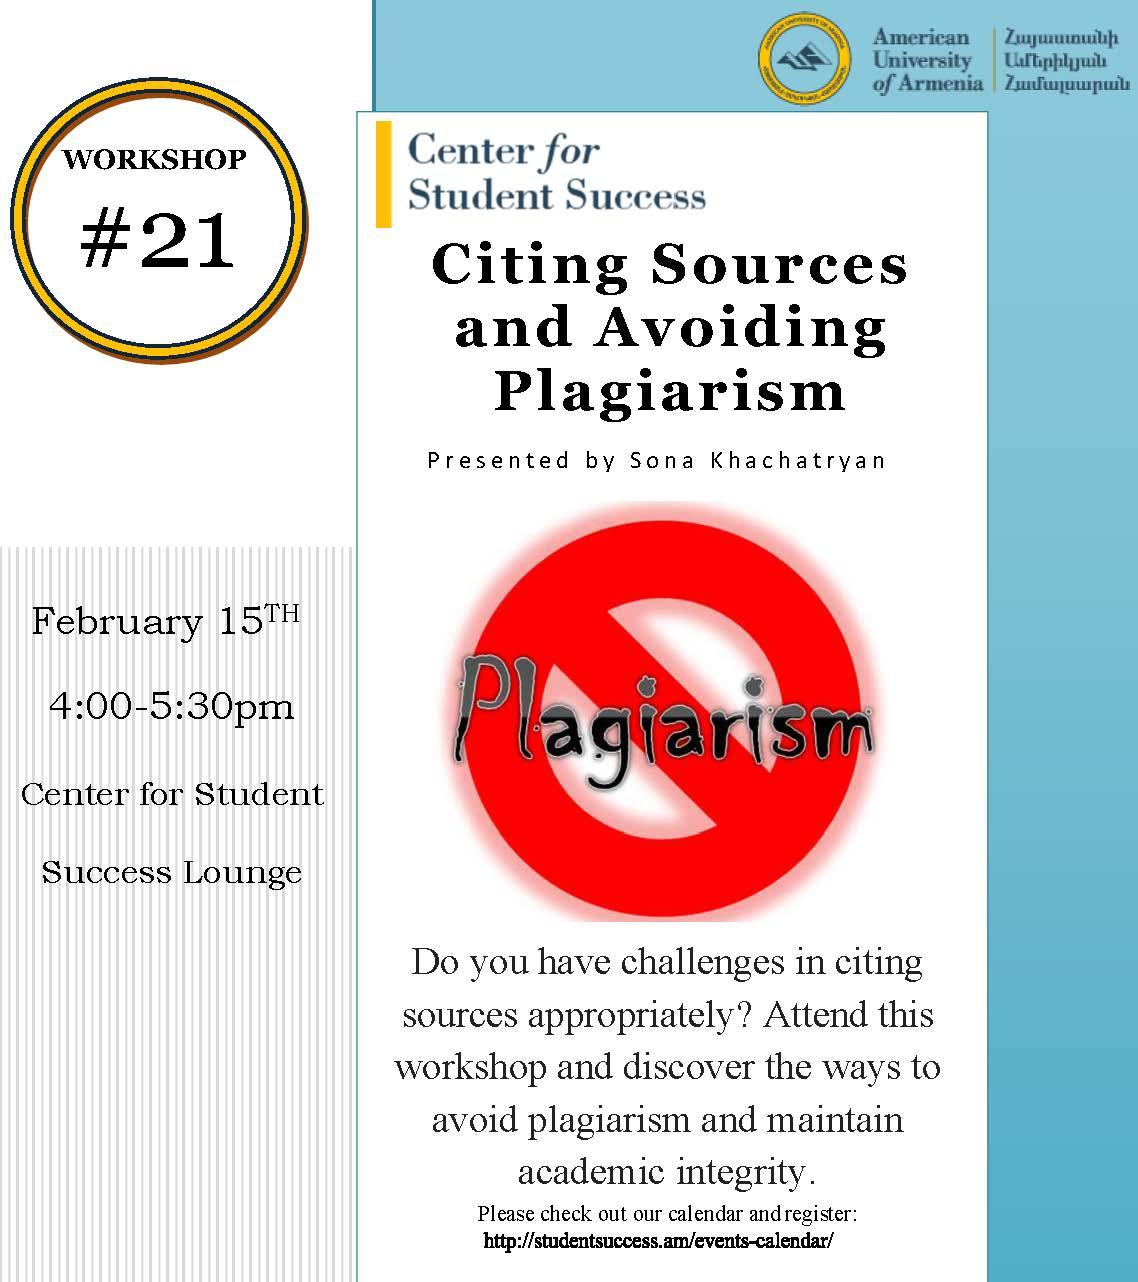 avoiding plagiarism by citing sources 411 chapel drive durham, nc 27708 (919) 660-5870 perkins library service desk.